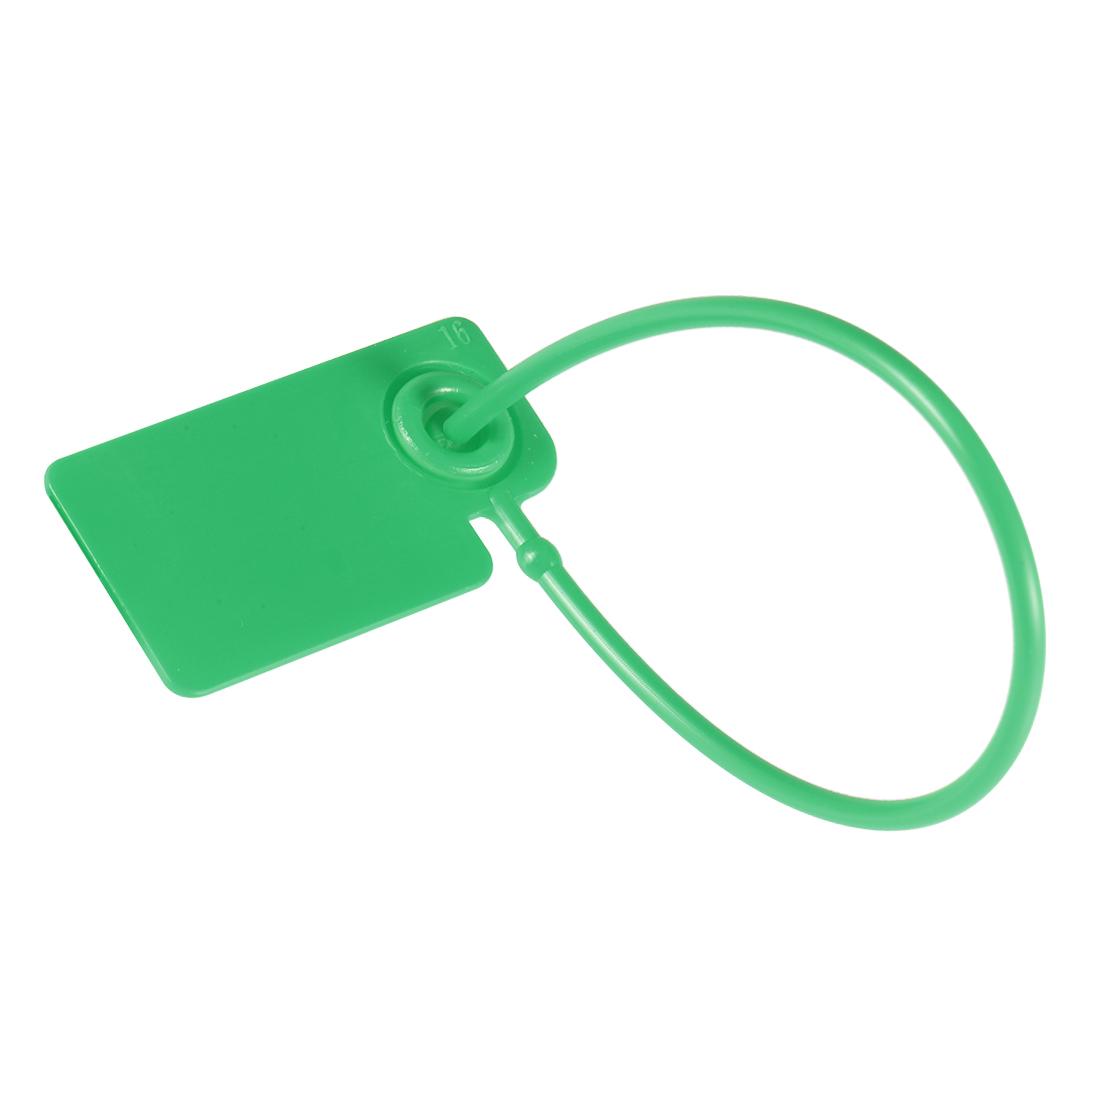 Plastic Zip Ties Security Tags Anti-Tamper 165mm Length, Green, 20pcs